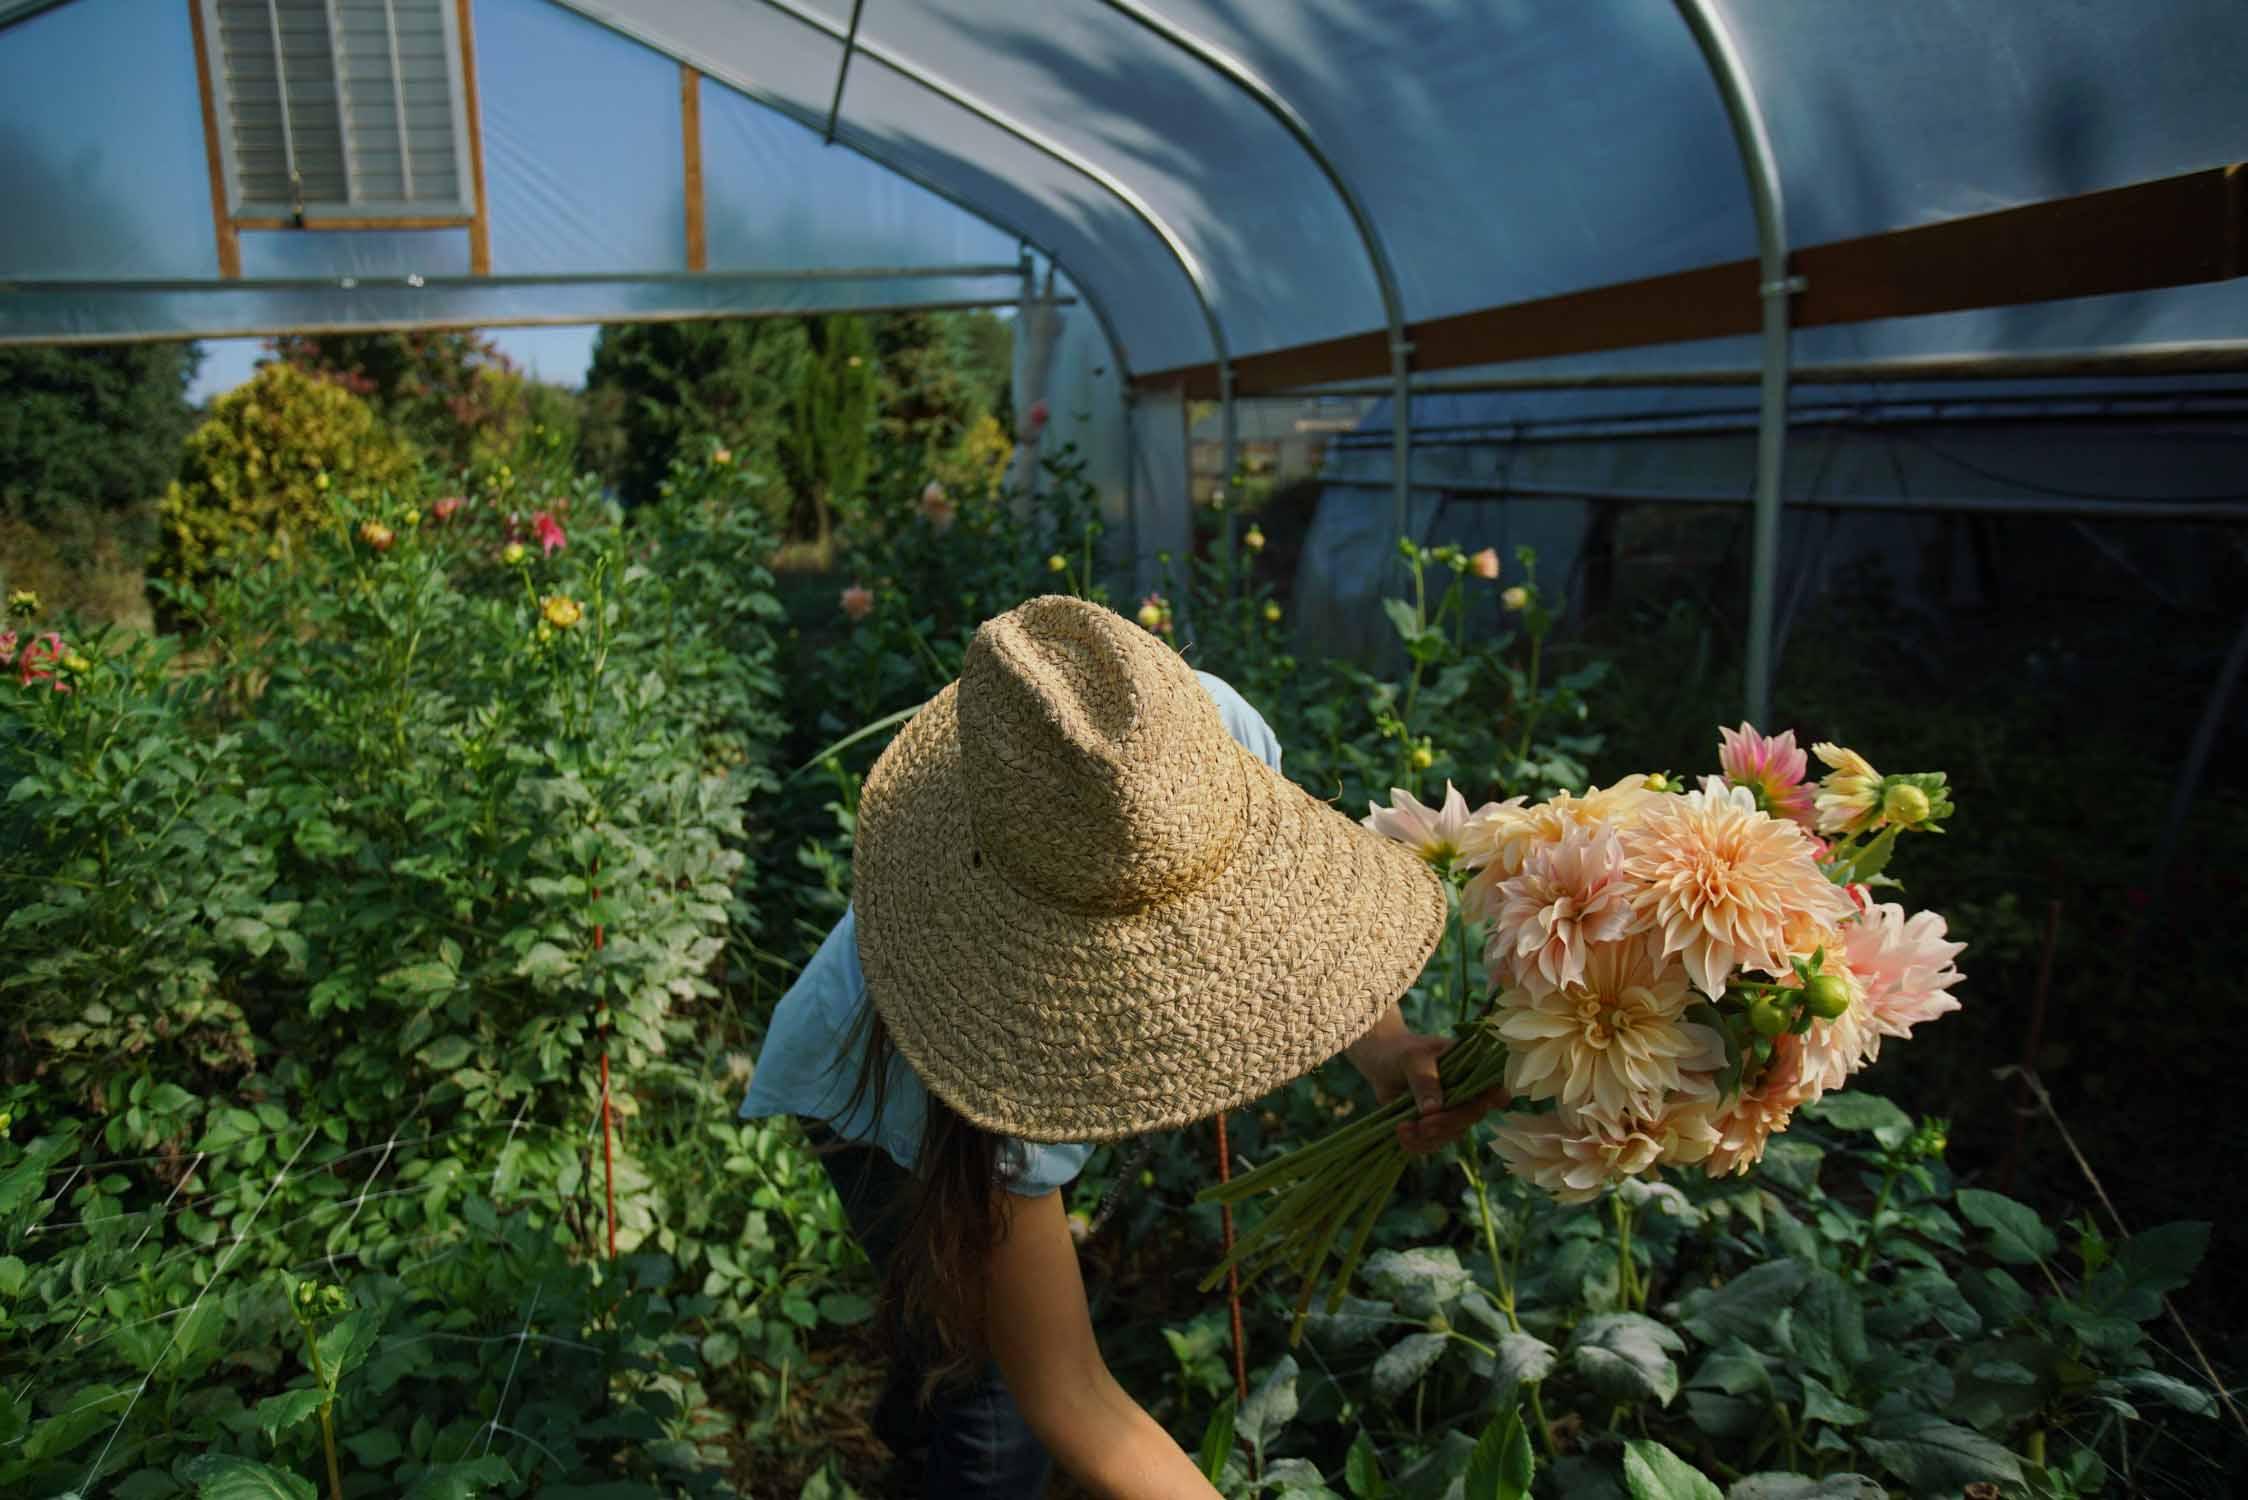 RA_3 porch farm flower social-2016101708890.jpg